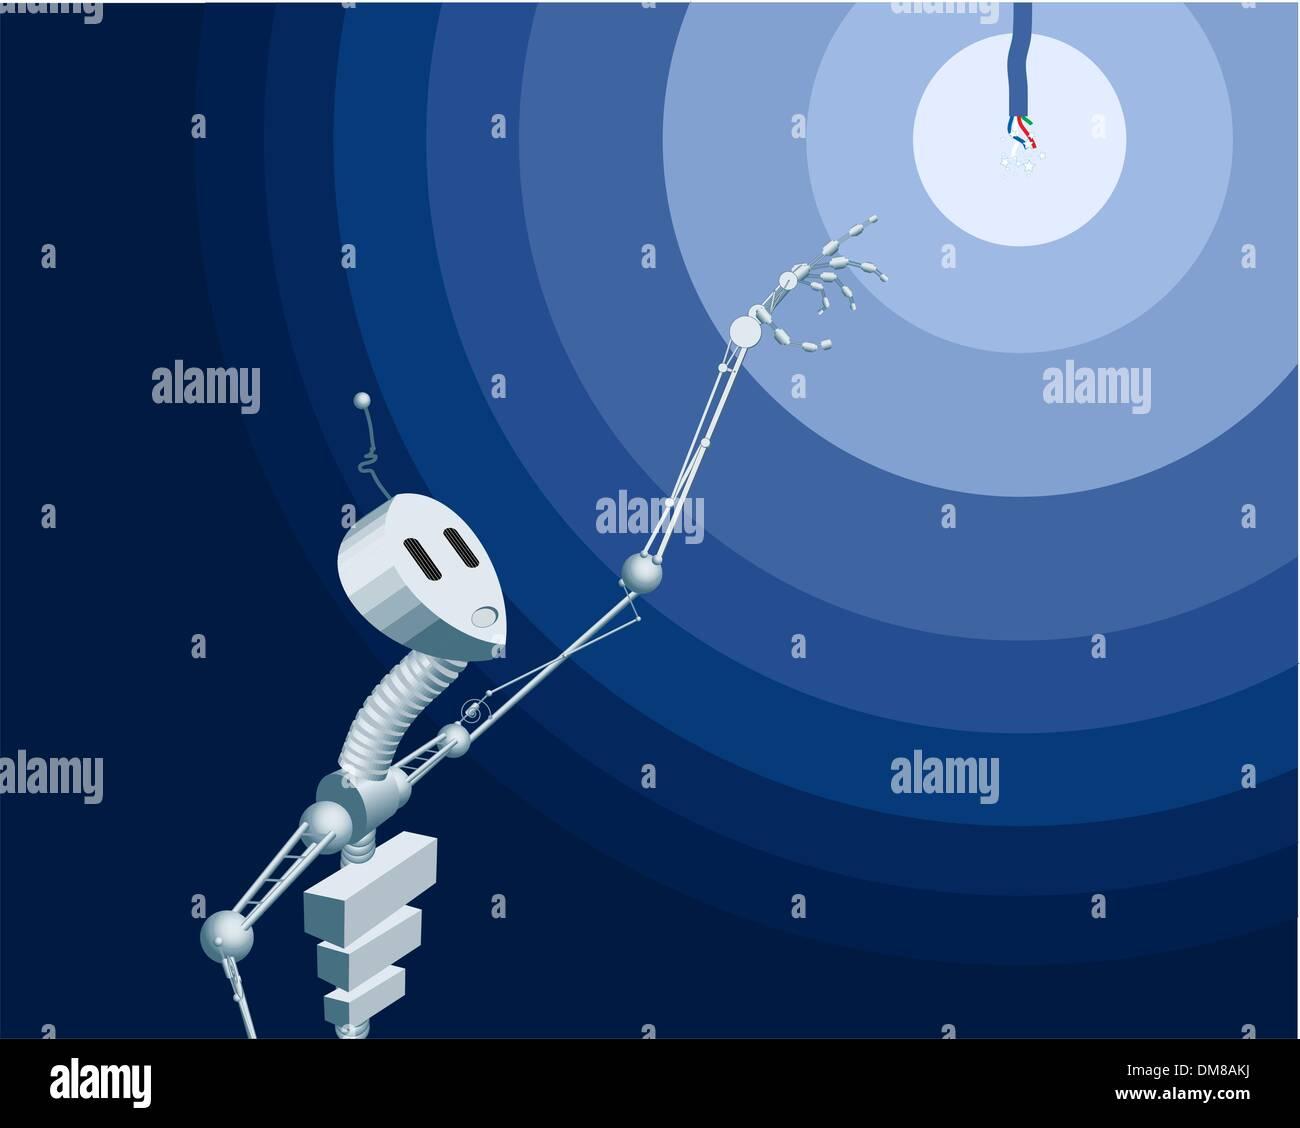 Robot interested in light - Stock Image